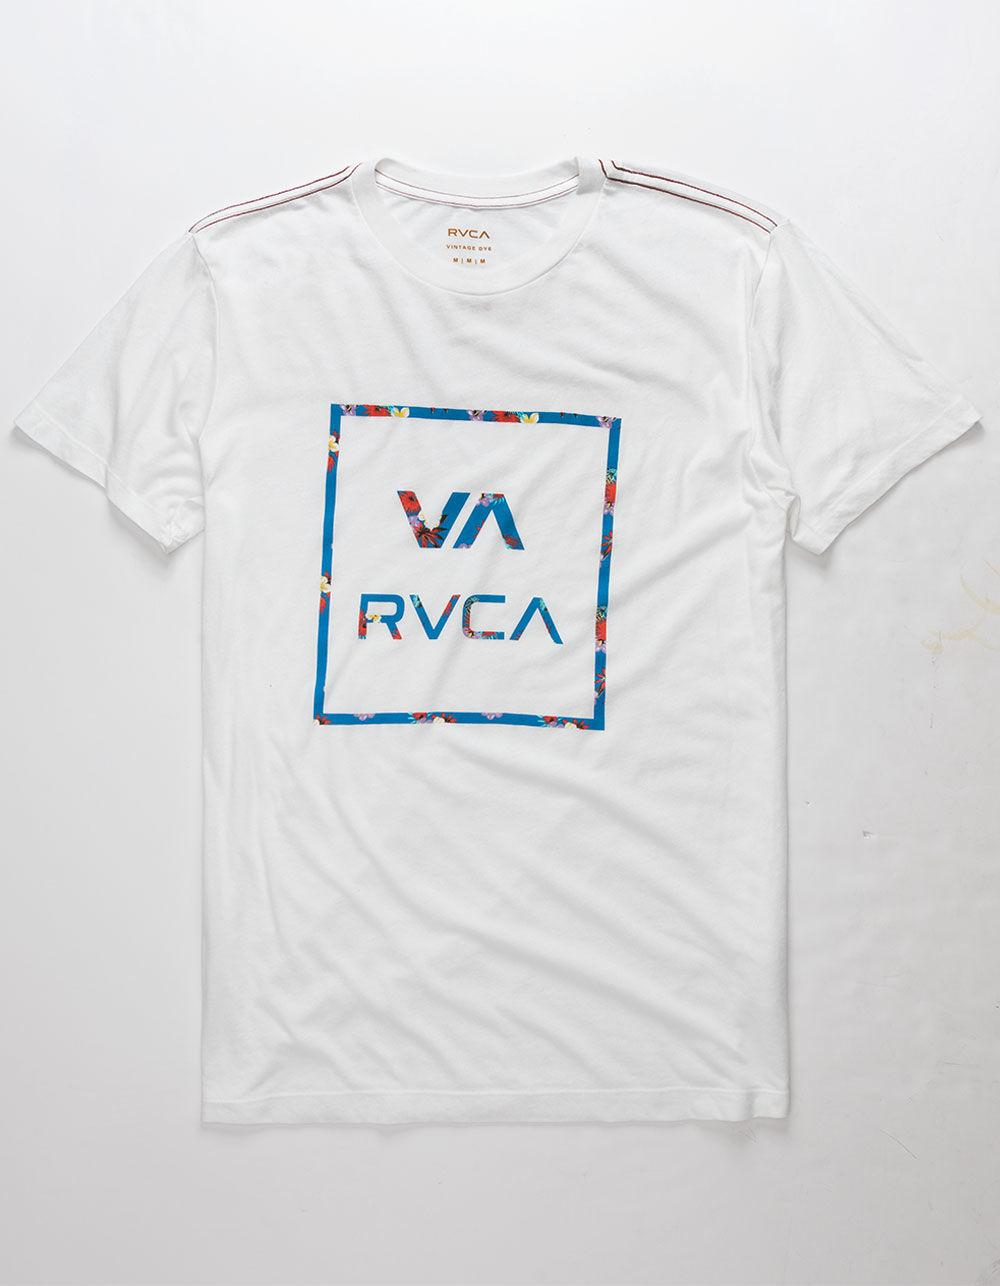 Rvca Shirts Meaning - Nils Stucki Kieferorthopäde